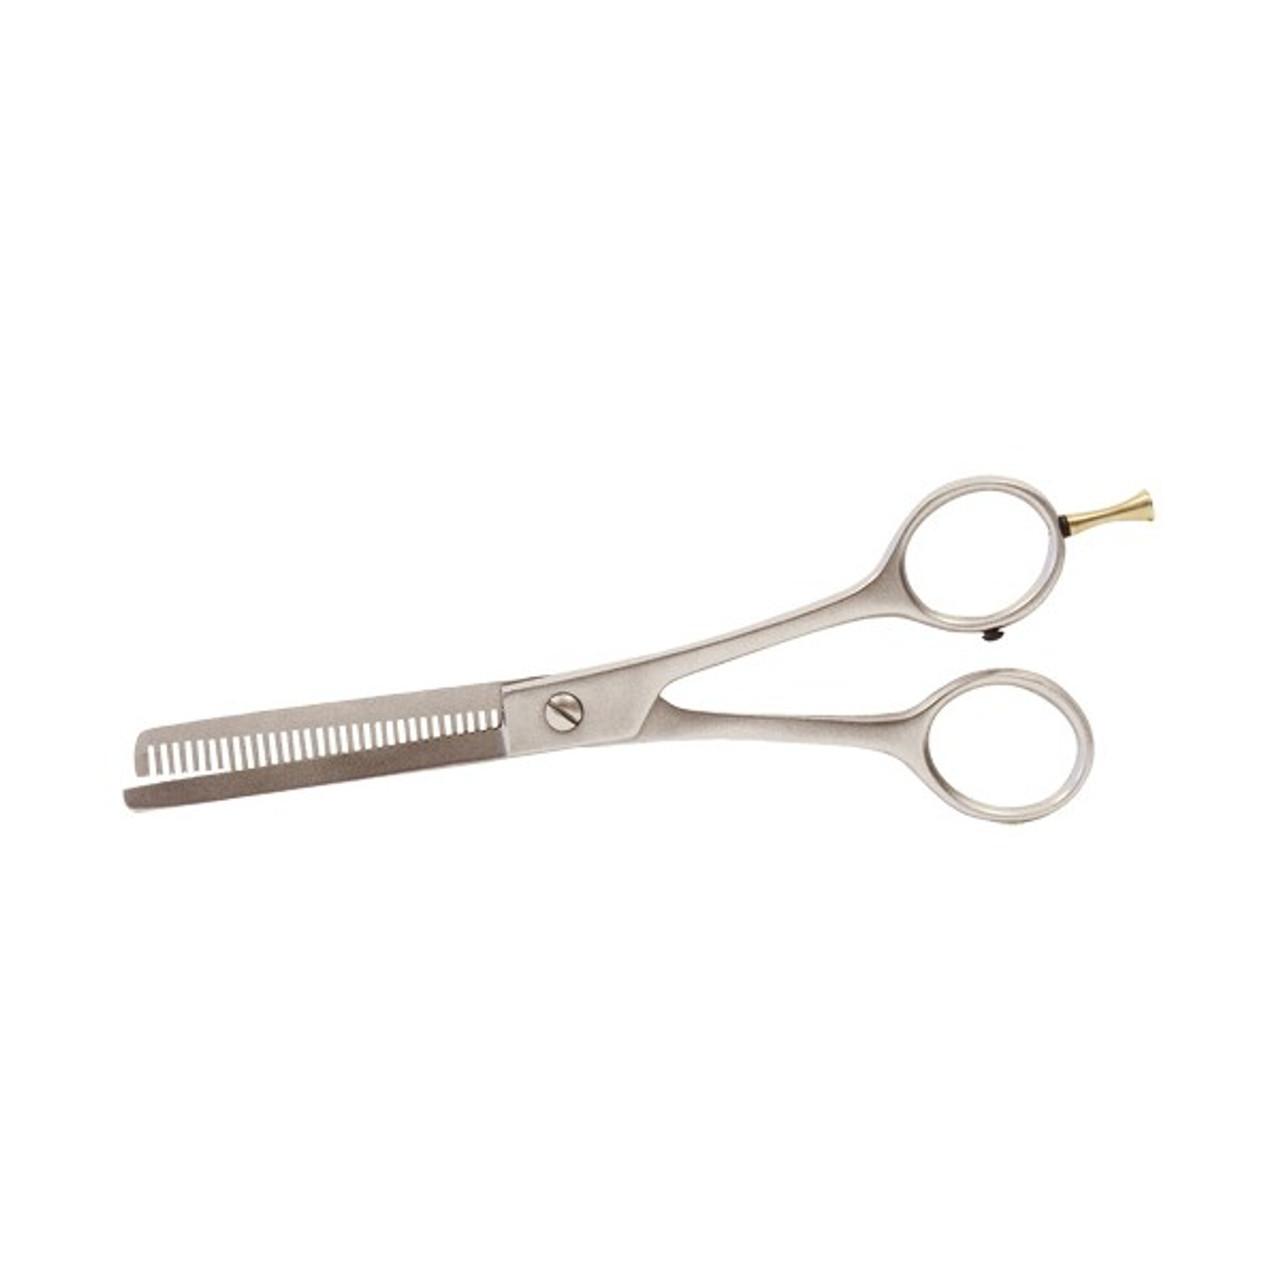 Idealcut 17cm Single Thinning Shears